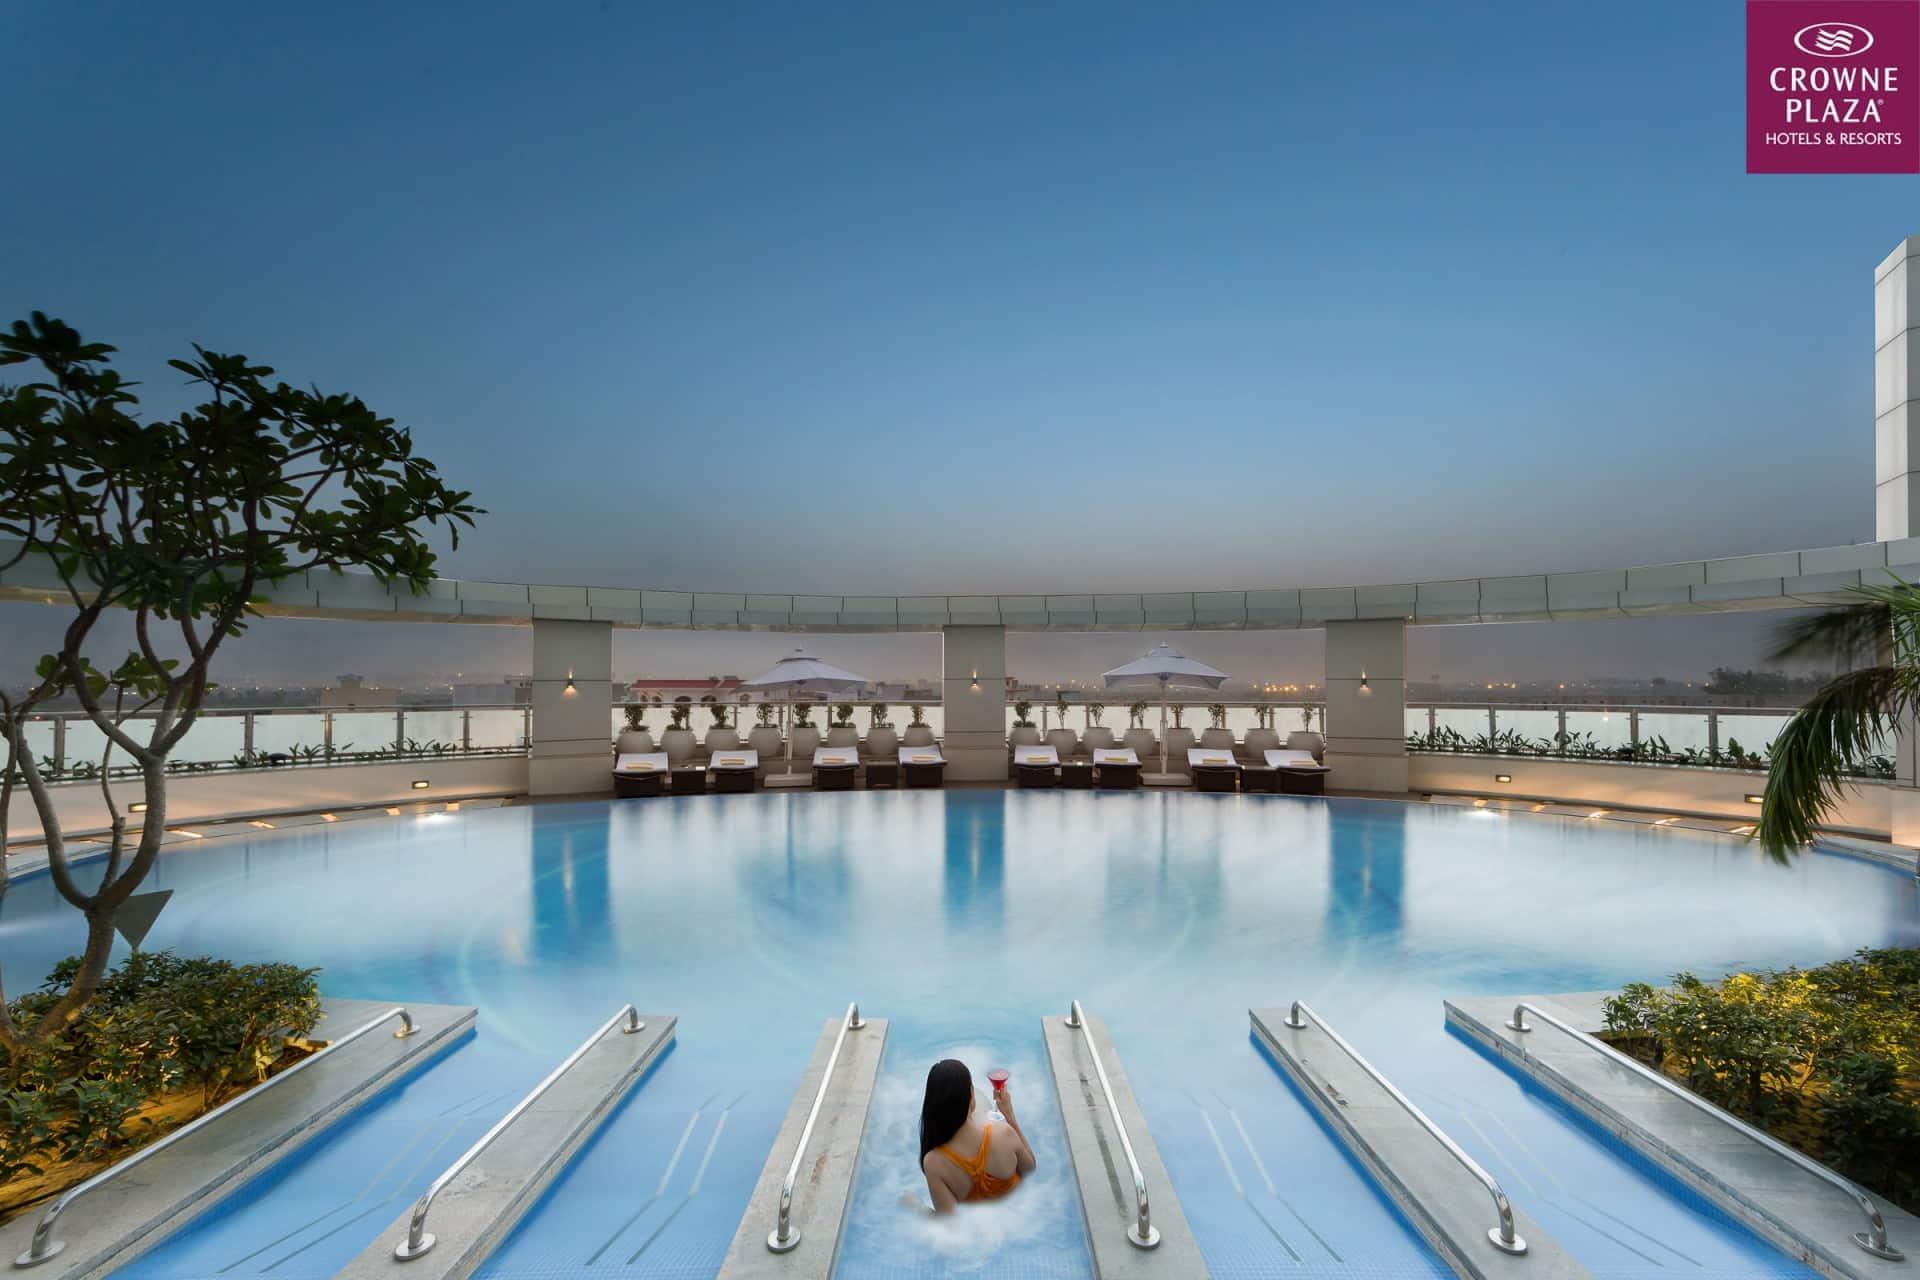 Best Architecture Photographer New Delhi   Crowne Plaza Noida Swimming Pool Photography